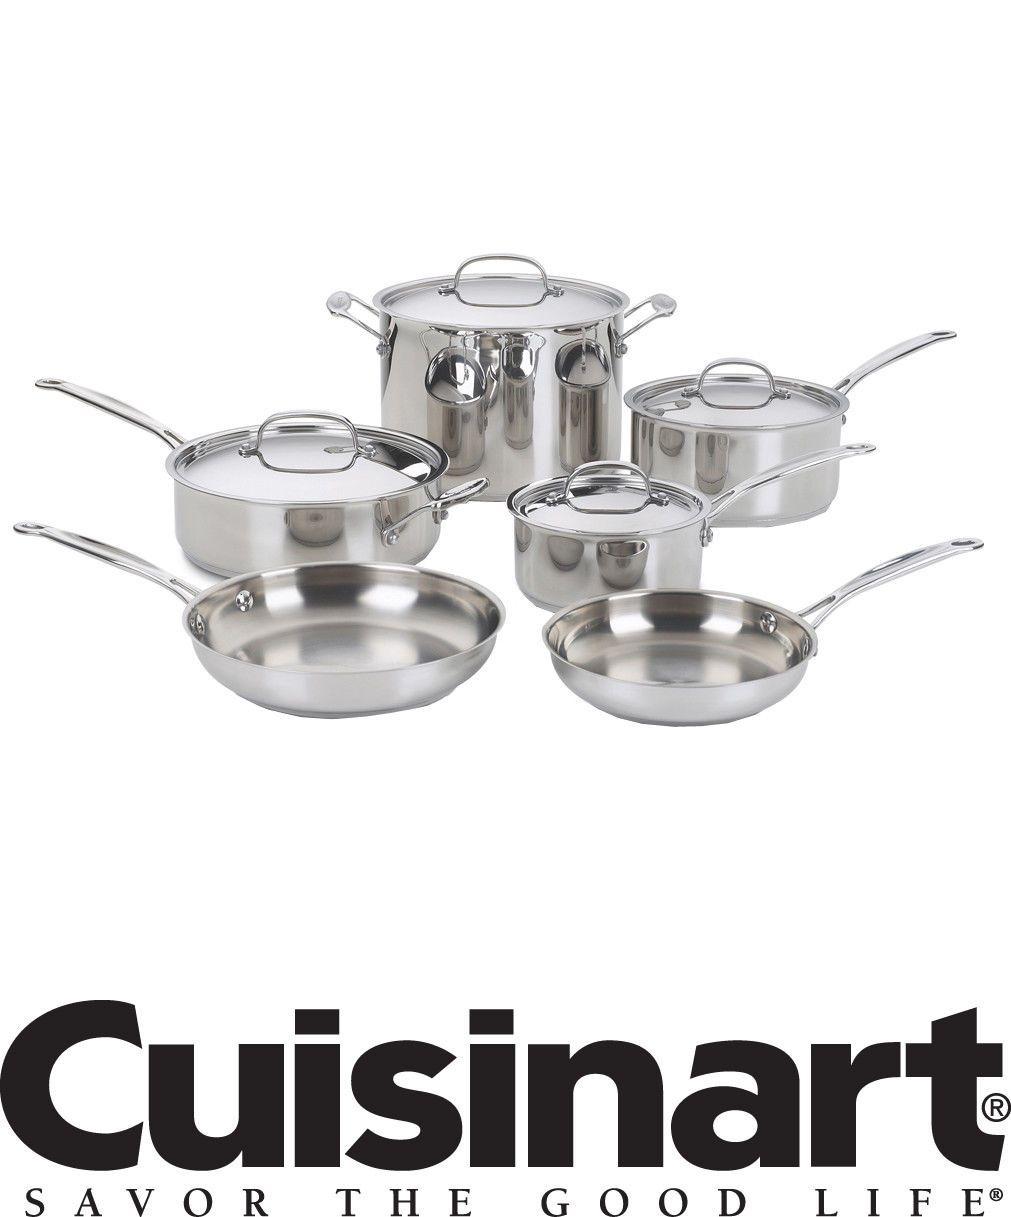 Pots Pans Cuisinart 77-10 Chef/'s Classic Stainless 10-Piece Cookware Pro Set